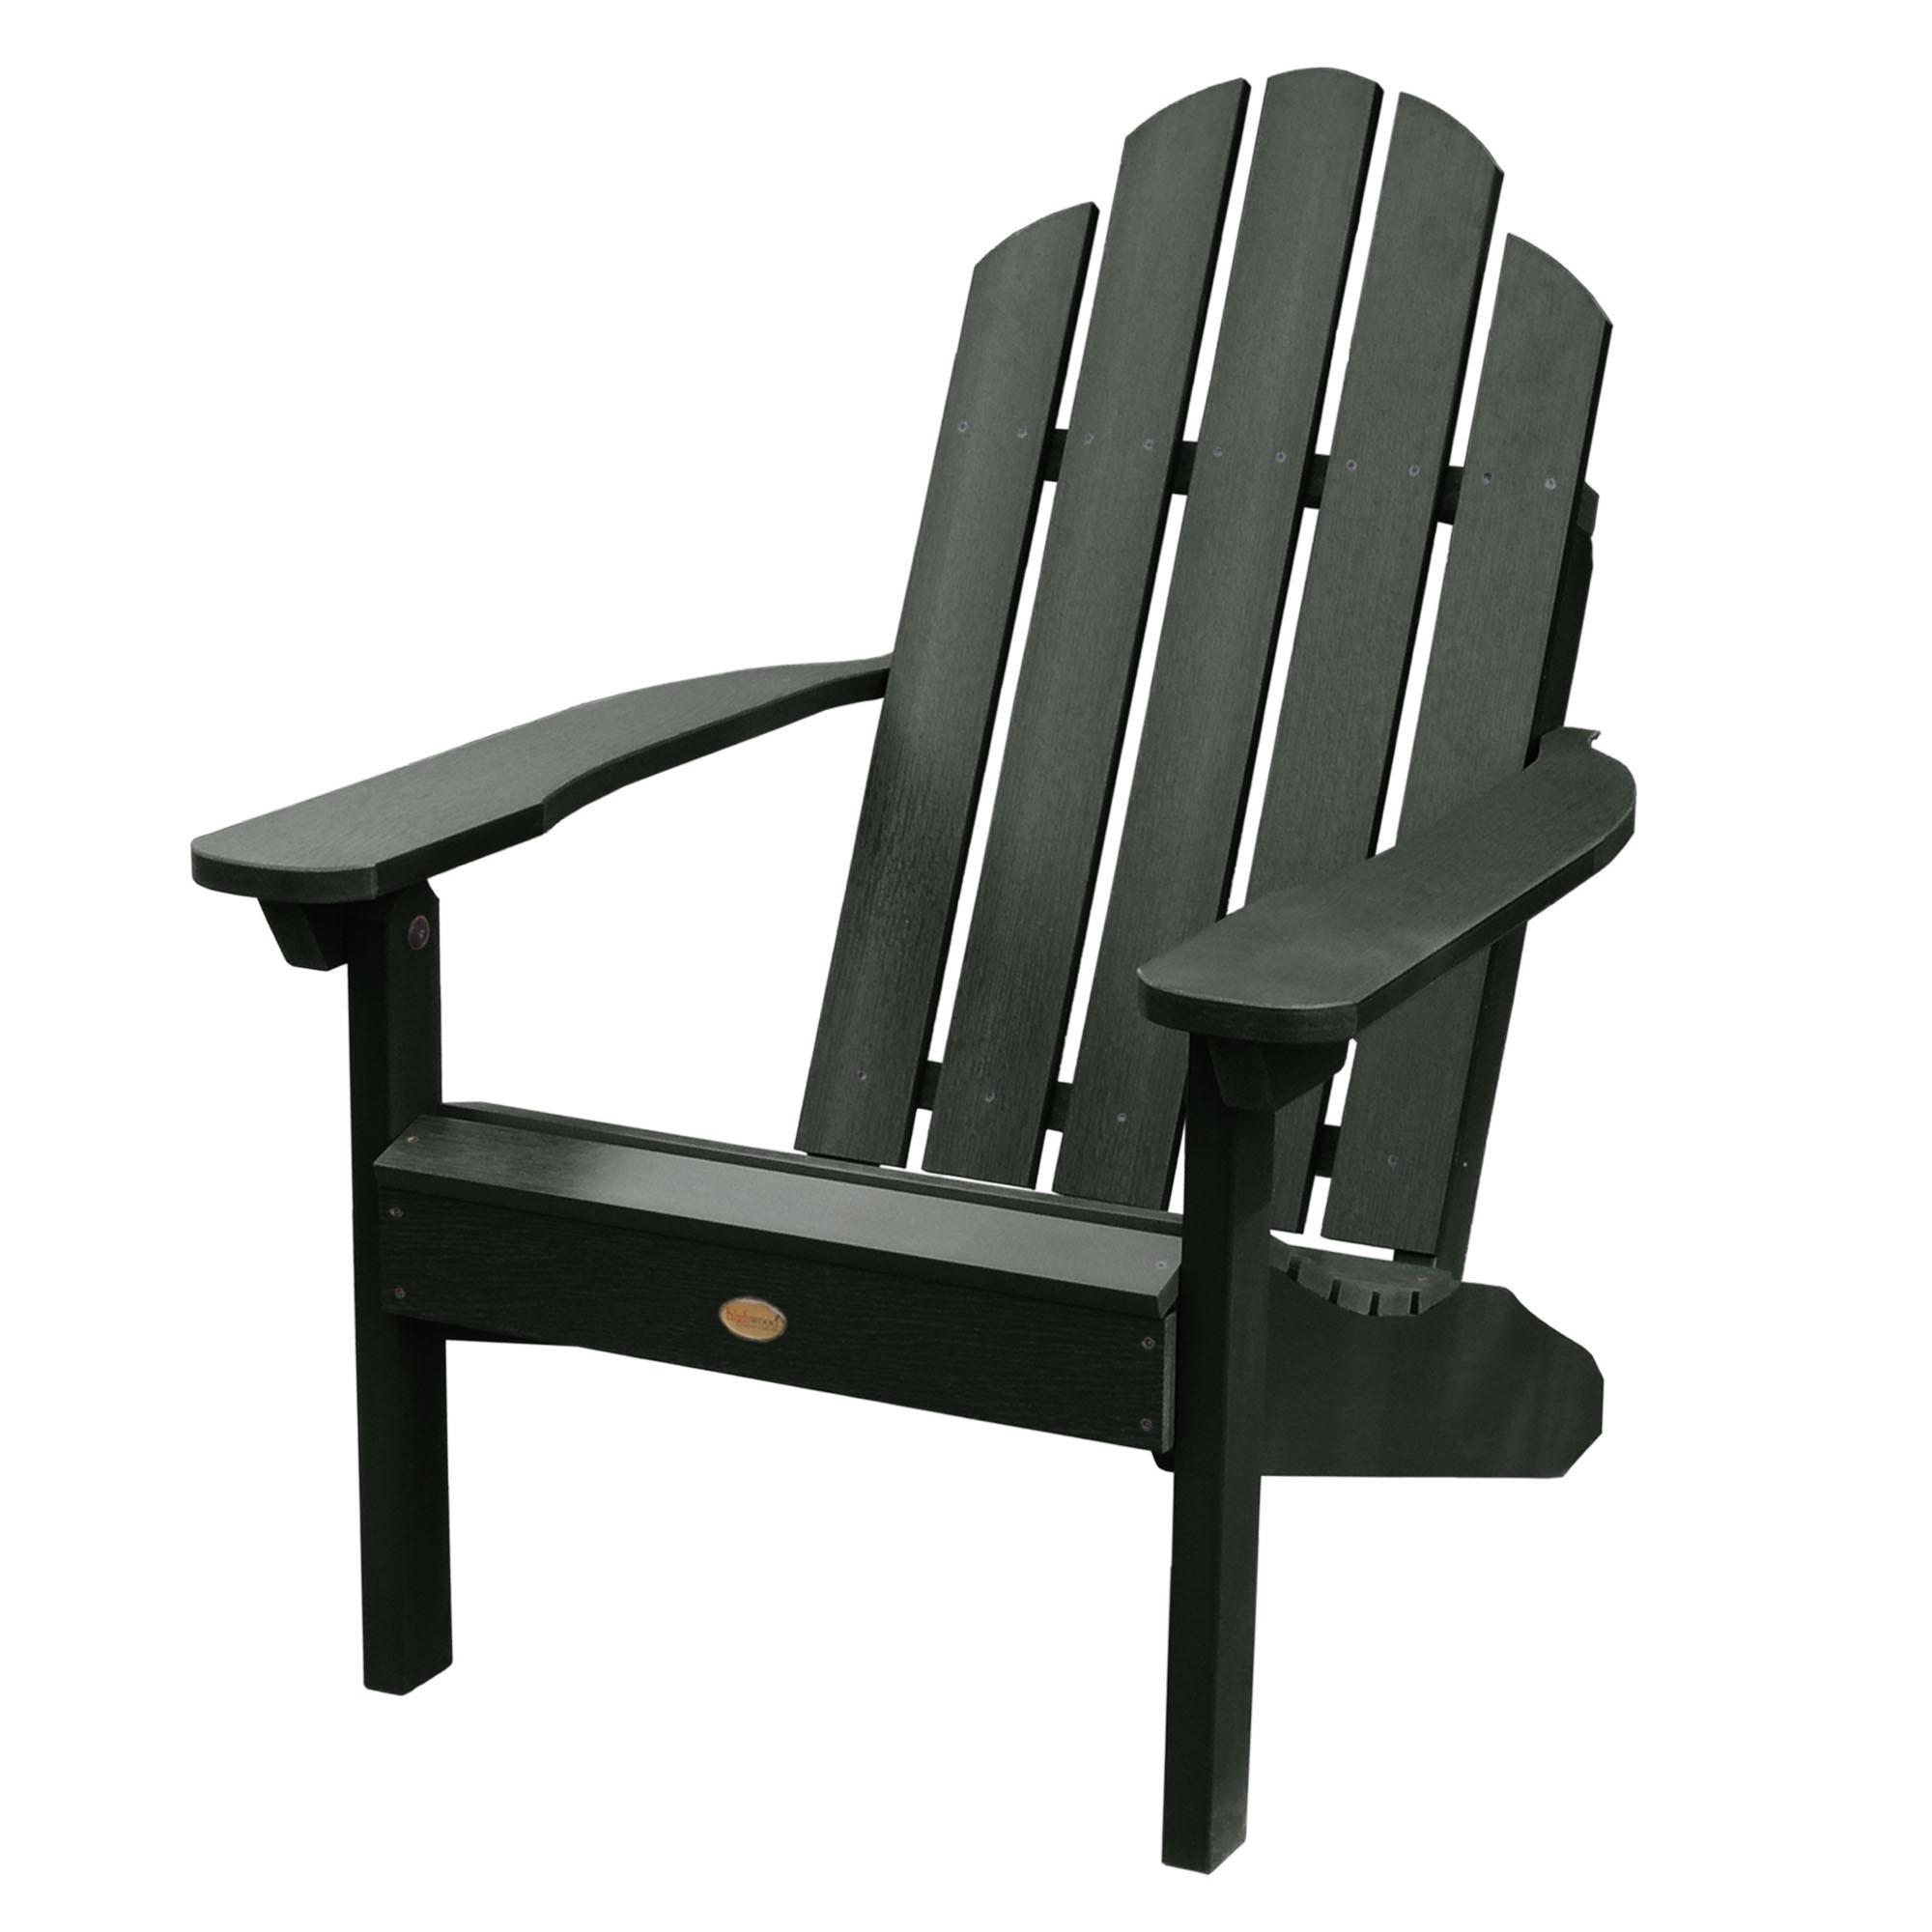 Classic Westport Adirondack Chair Charleston Green - Highwood